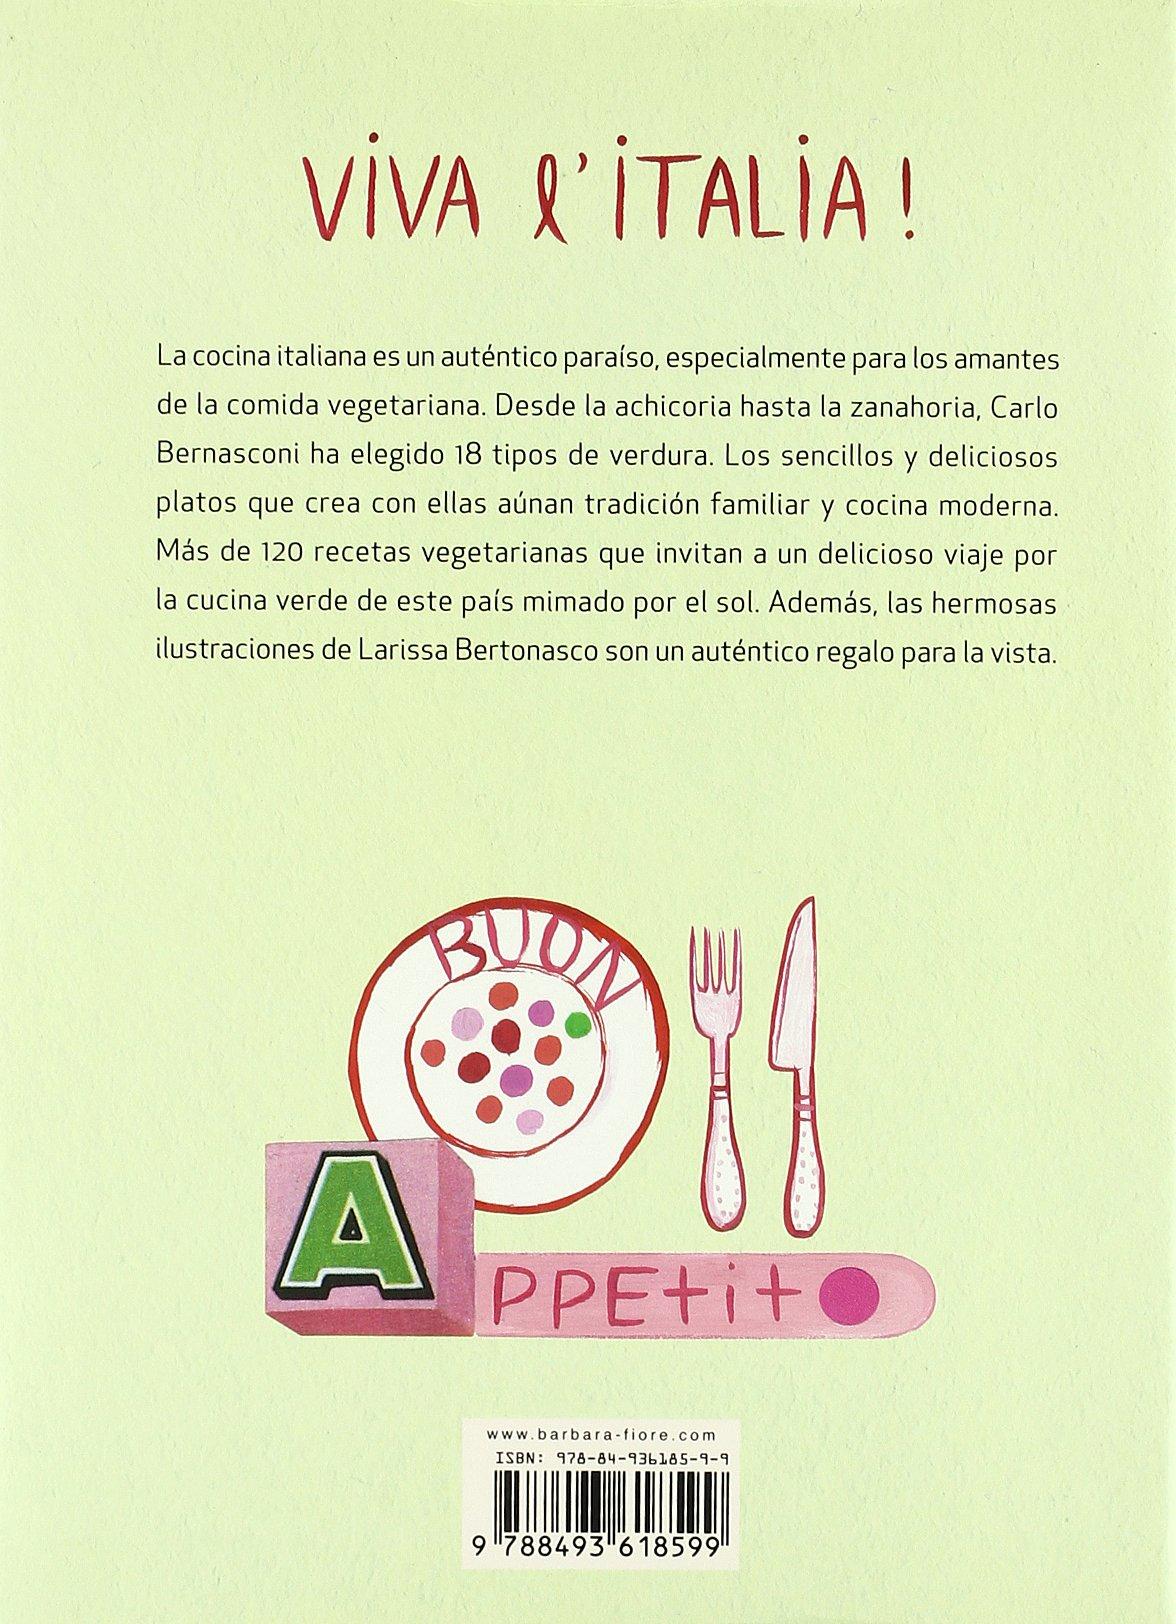 La cucina verde: Amazon.es: Carlo Bernasconi, Larissa Bertonasco ...